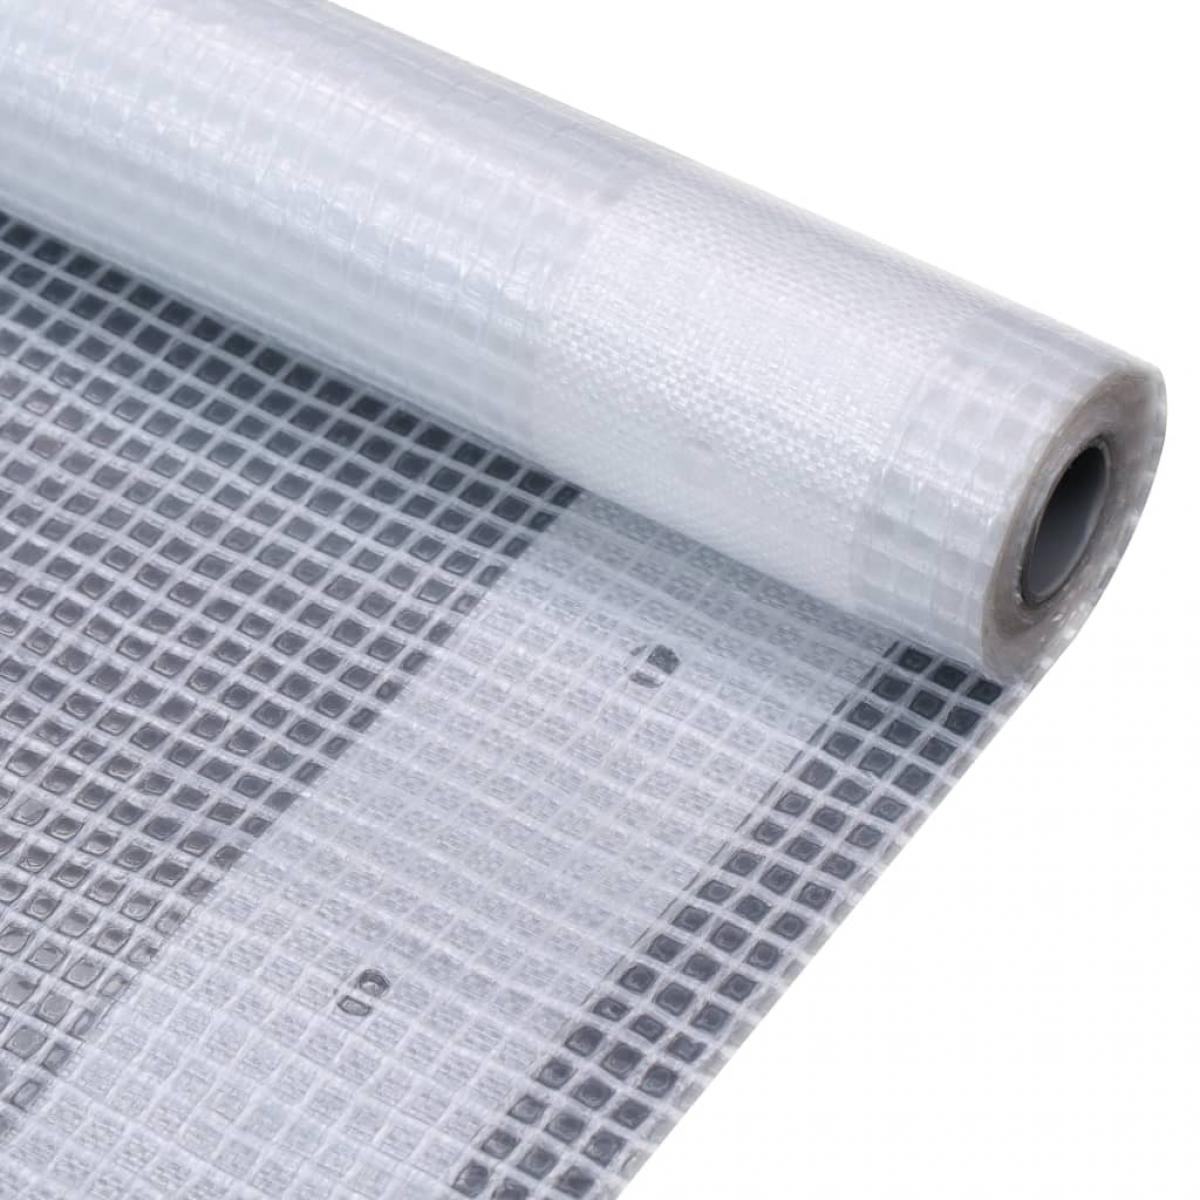 Vidaxl vidaXL Bâche Leno 260 g/m² 1,5 x 5 m Blanc